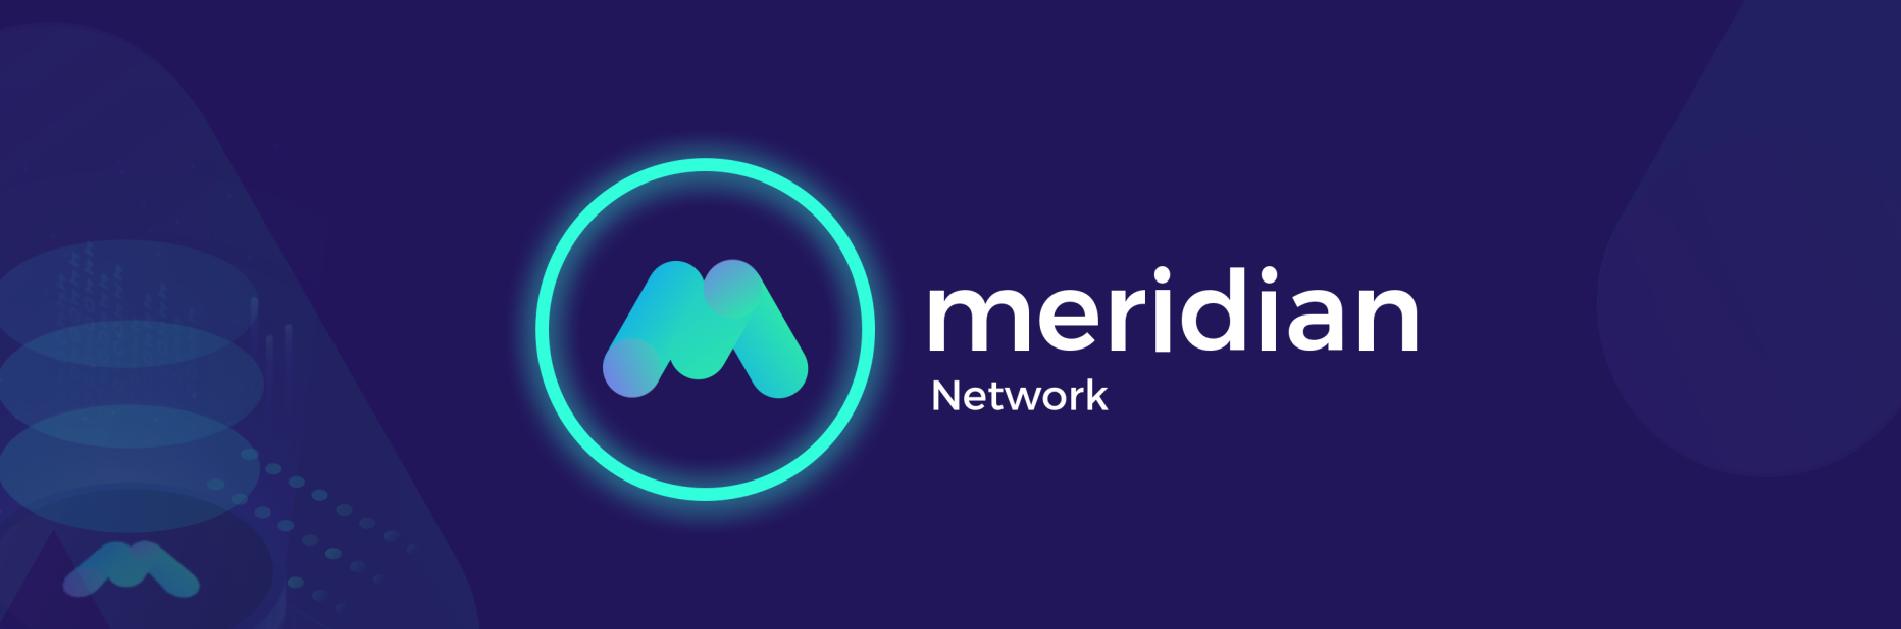 Meridian Network1